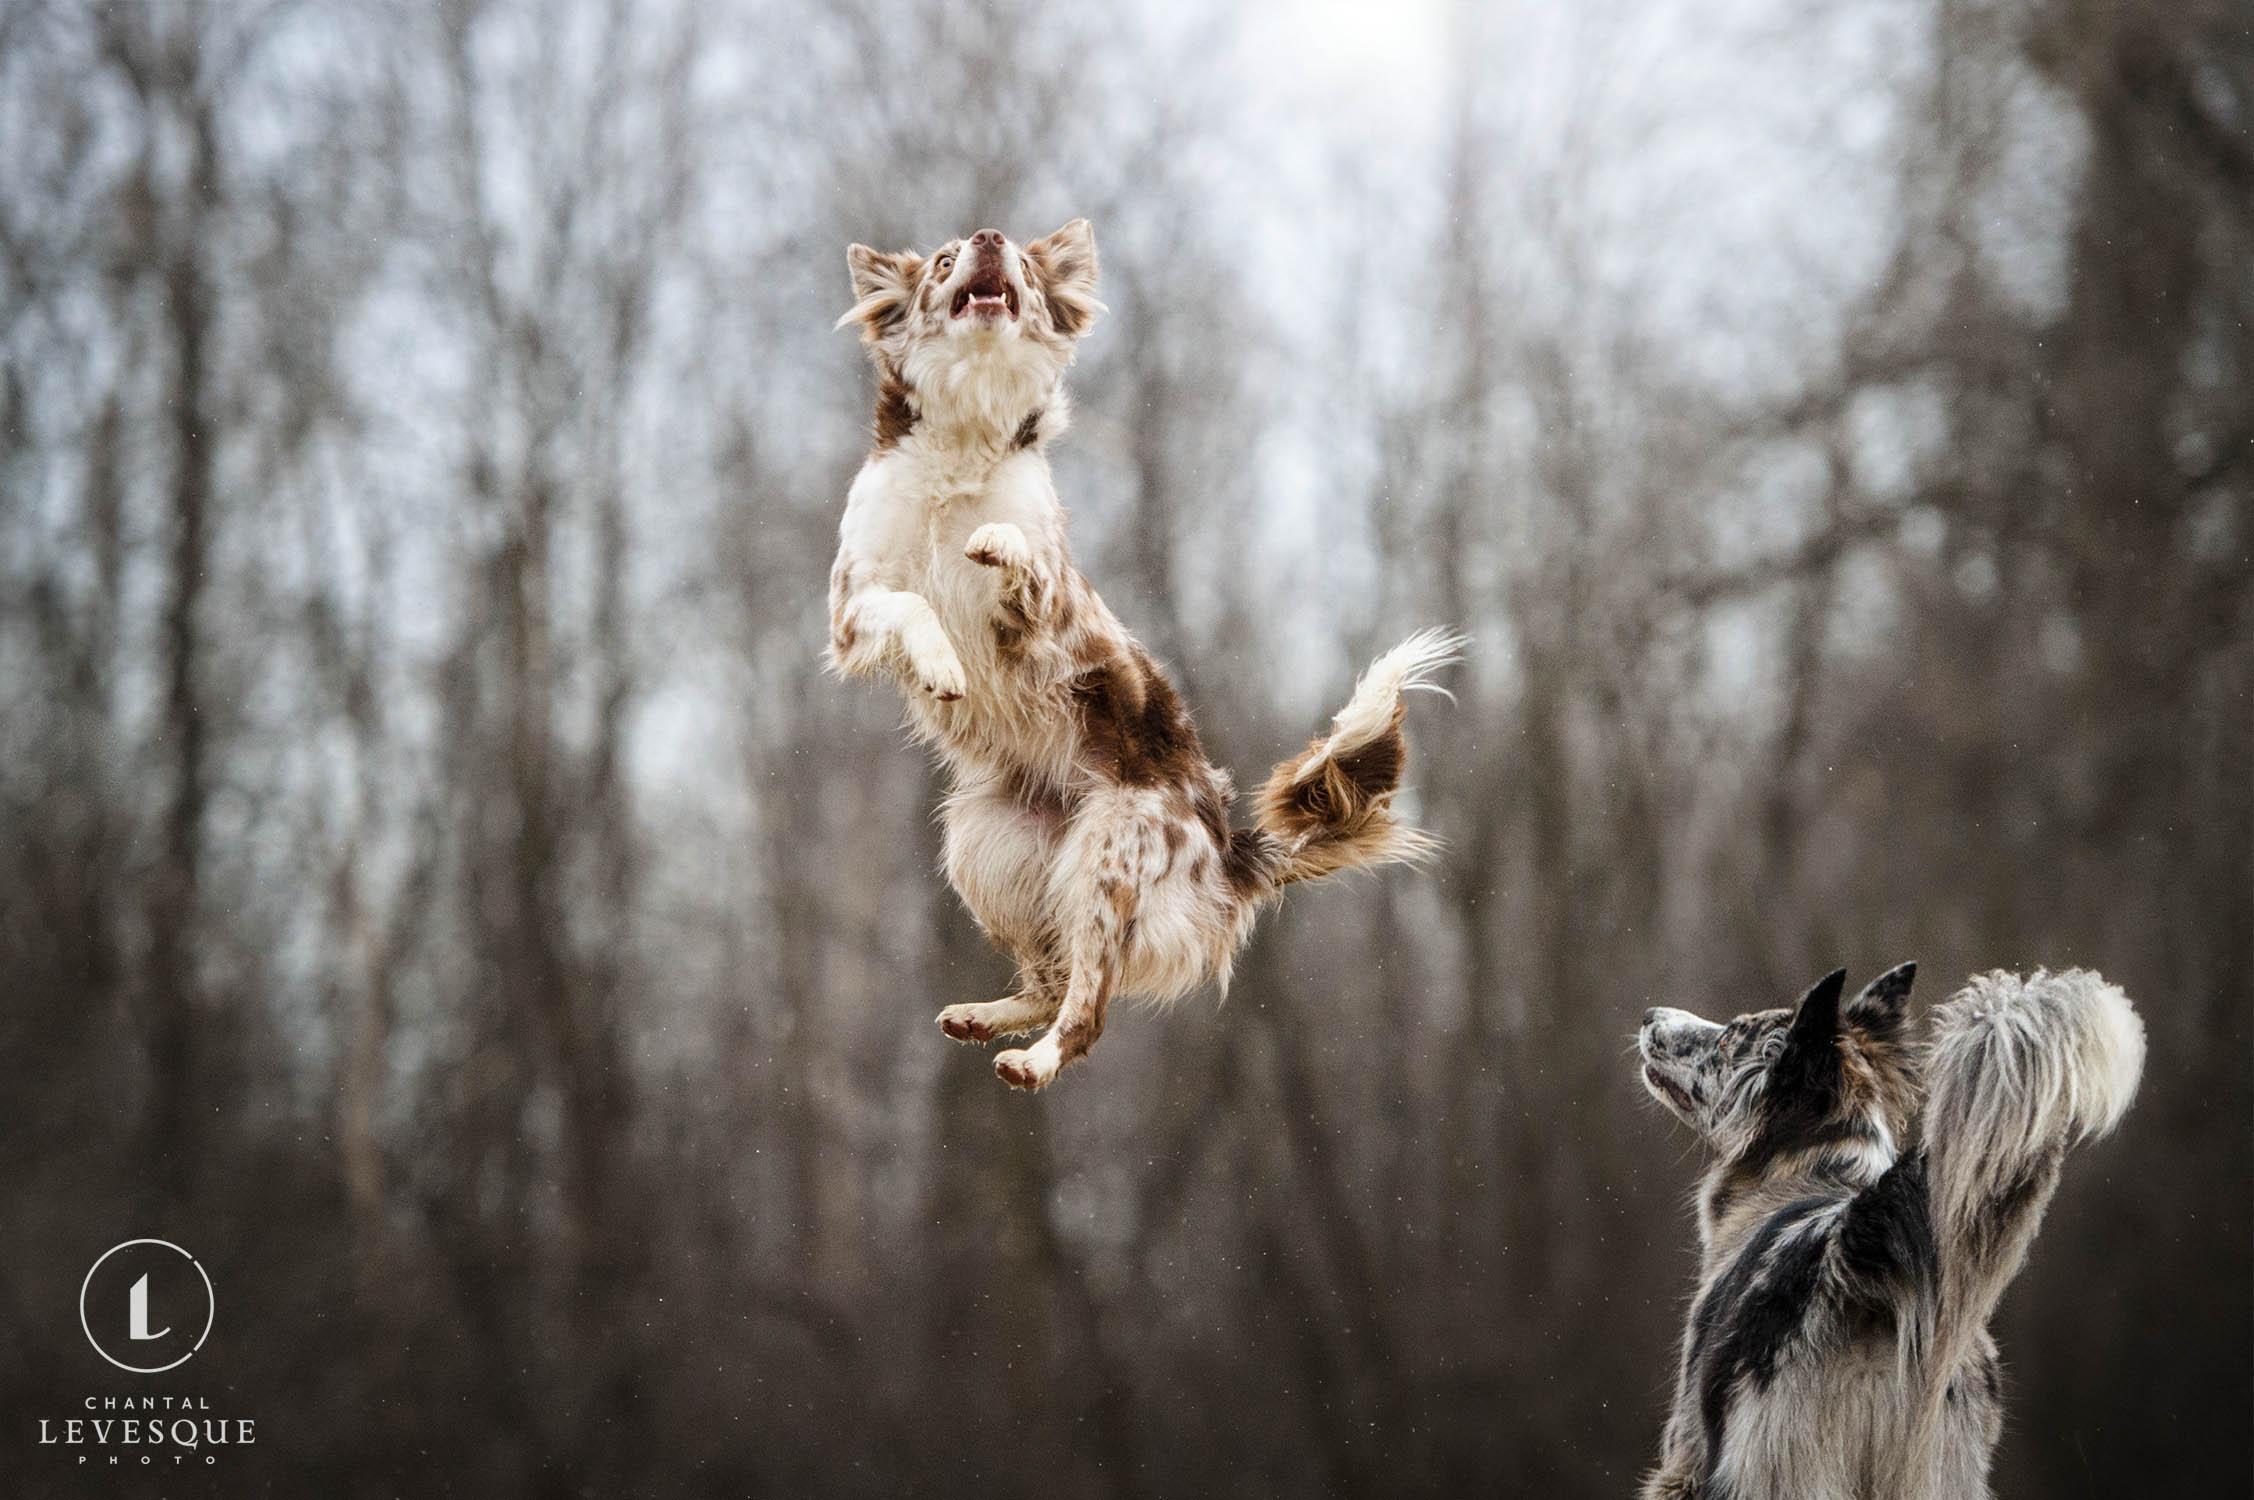 jumping-dog-photo.jpg